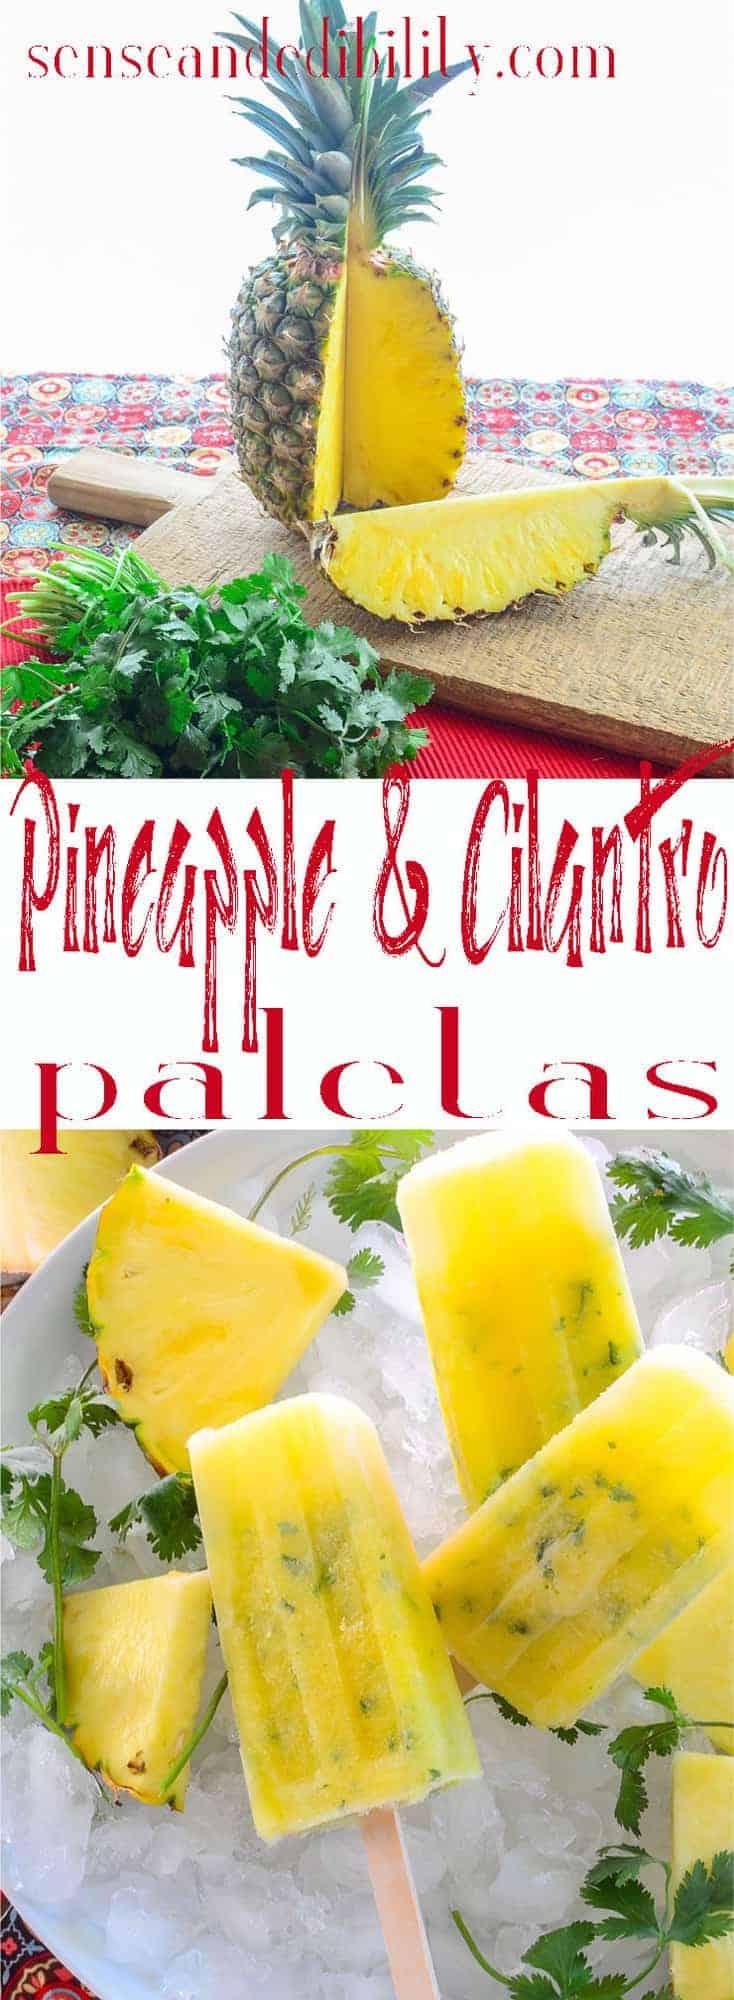 Pineapple Cilantro Paletas Pin